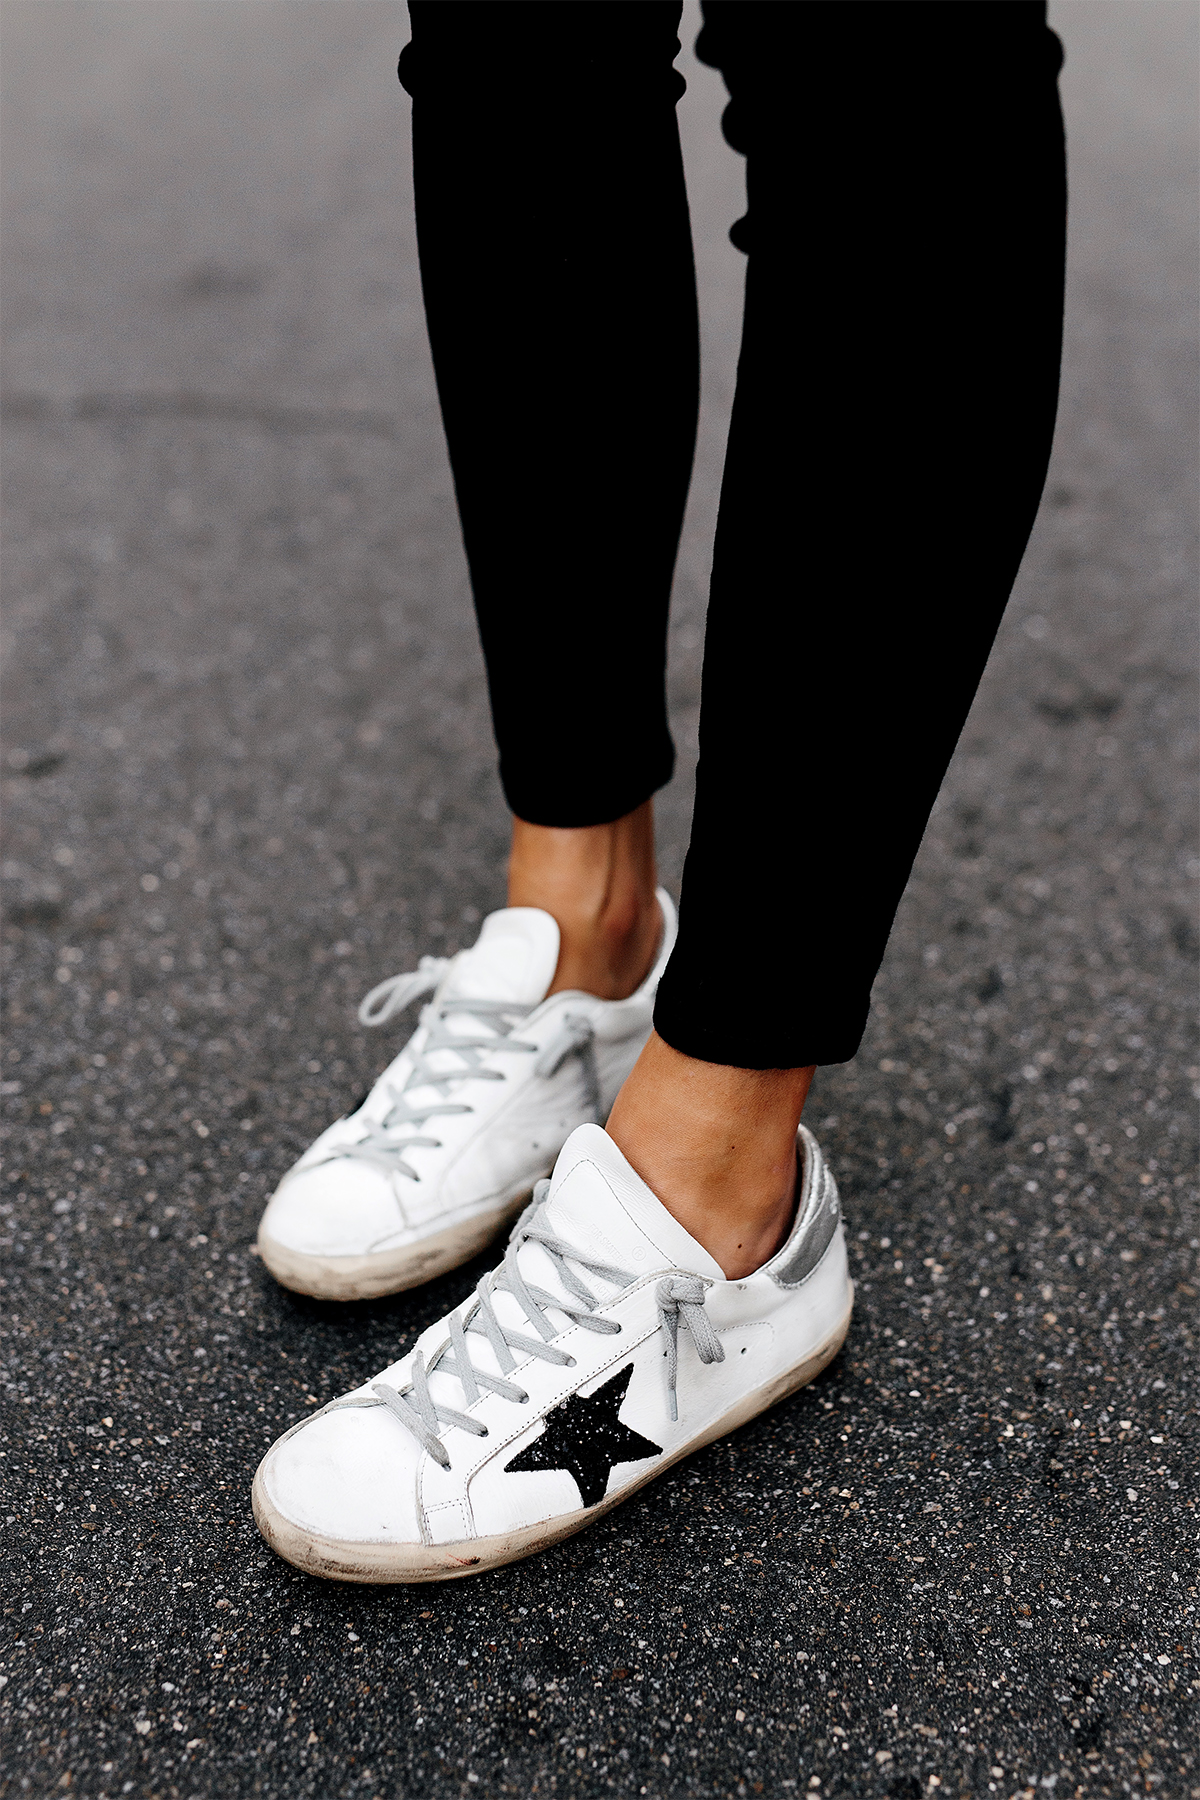 5 Tips for Buying Golden Goose Sneakers